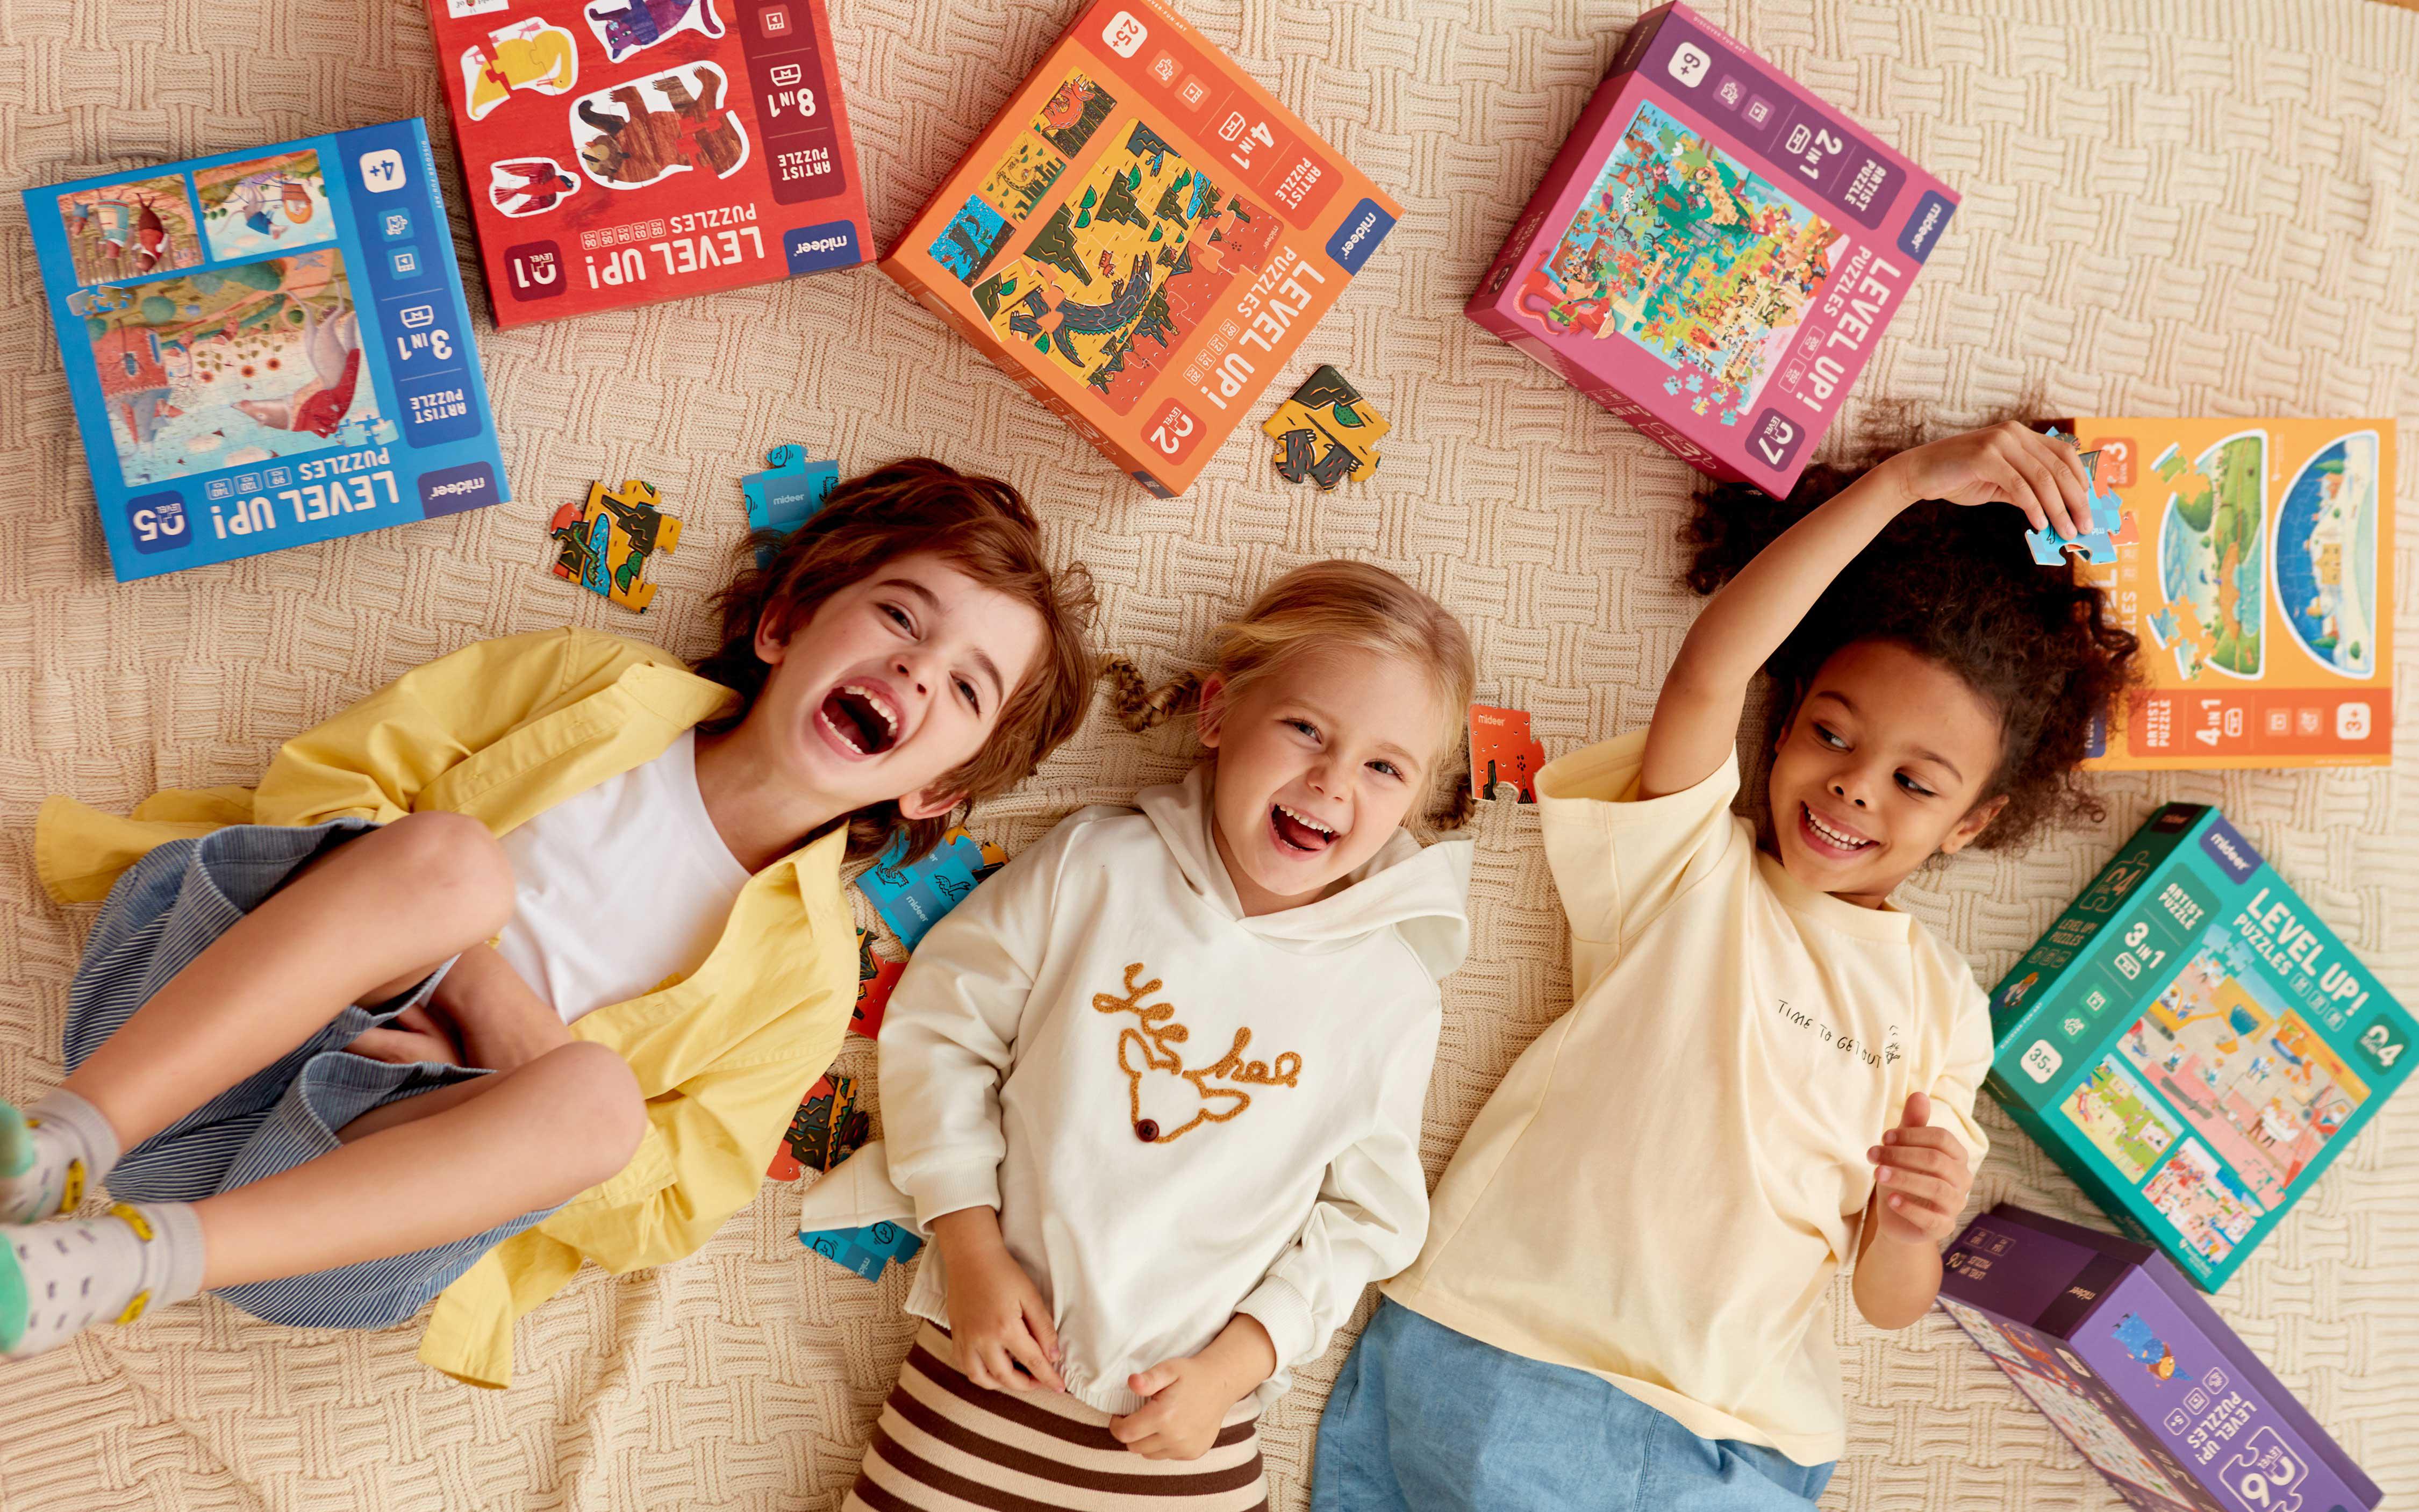 mideer弥鹿:想用「艺术+玩具」连接世界的童年 BrandStar专访